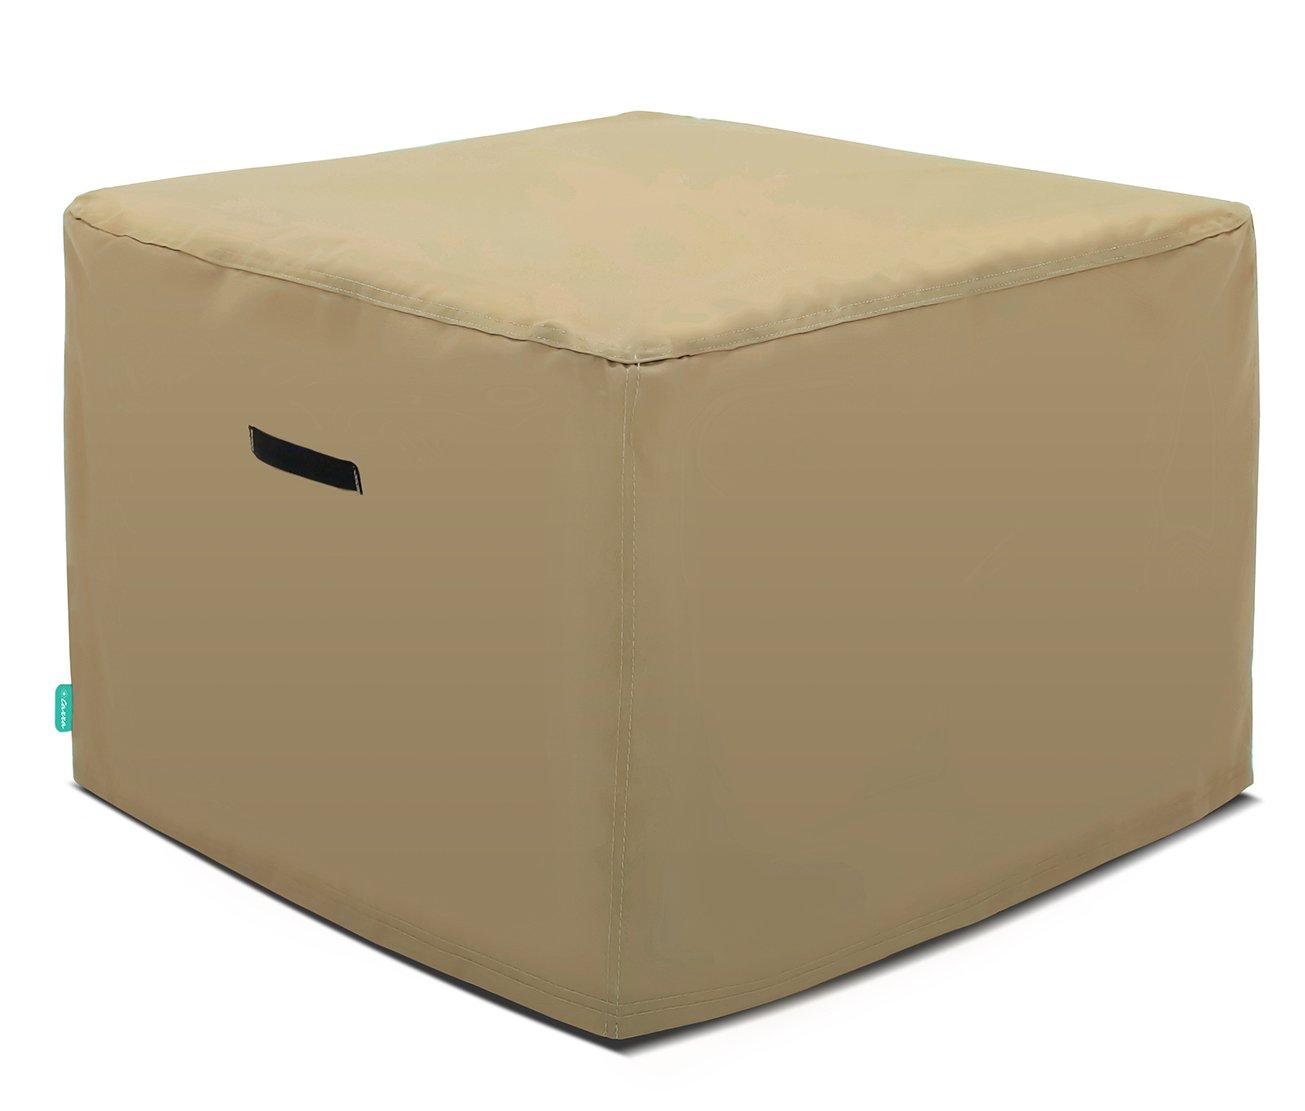 Tarra Home Universal Outdoor Patio Square Table Cover, 38'' W x 38'' D x 30'' H, Presidium Tan